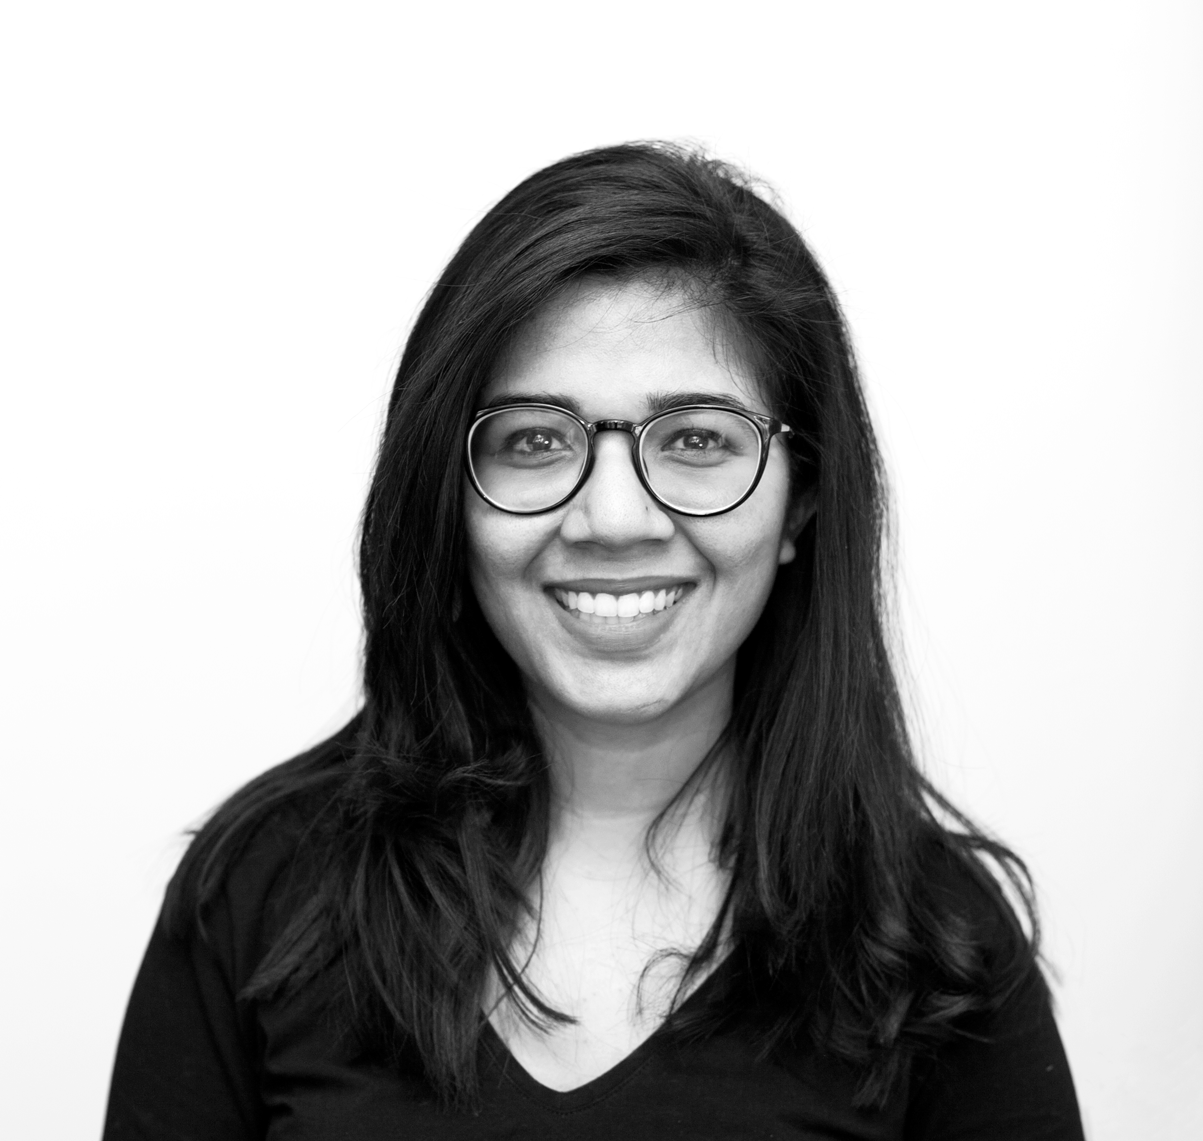 Portrait_Anukriti-Kedia.png